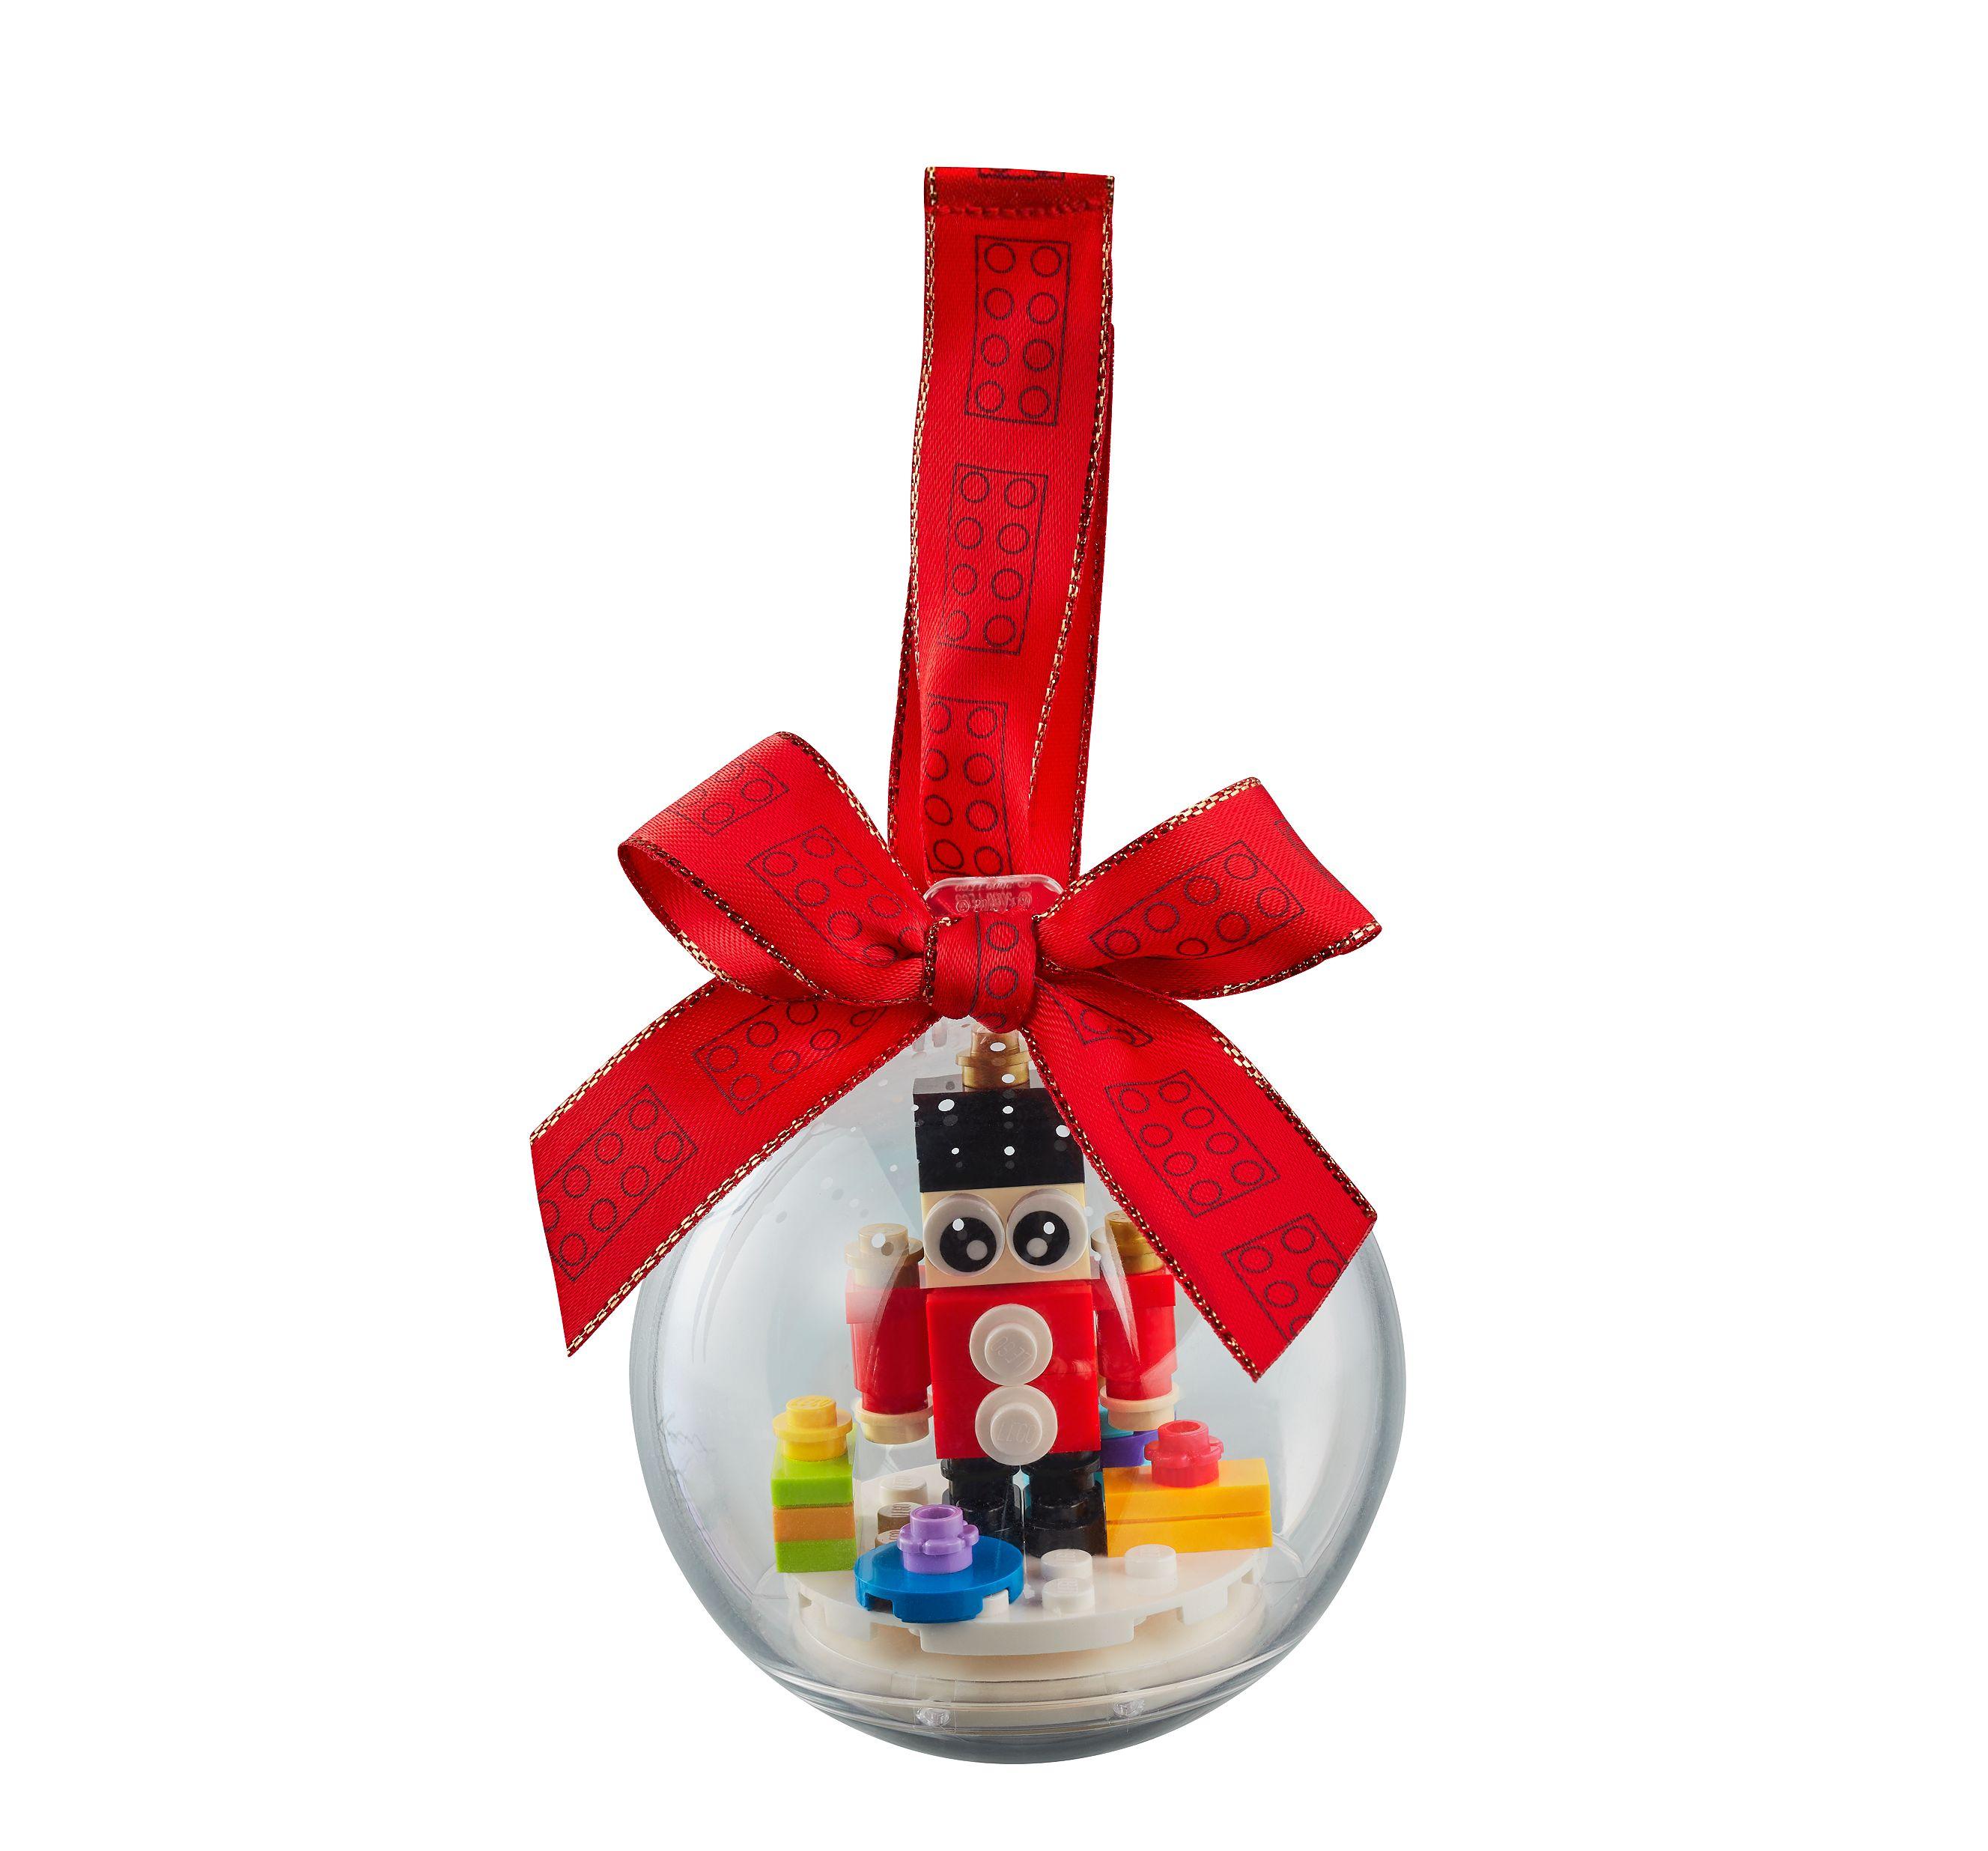 LEGO® julepynt – legetøjssoldat